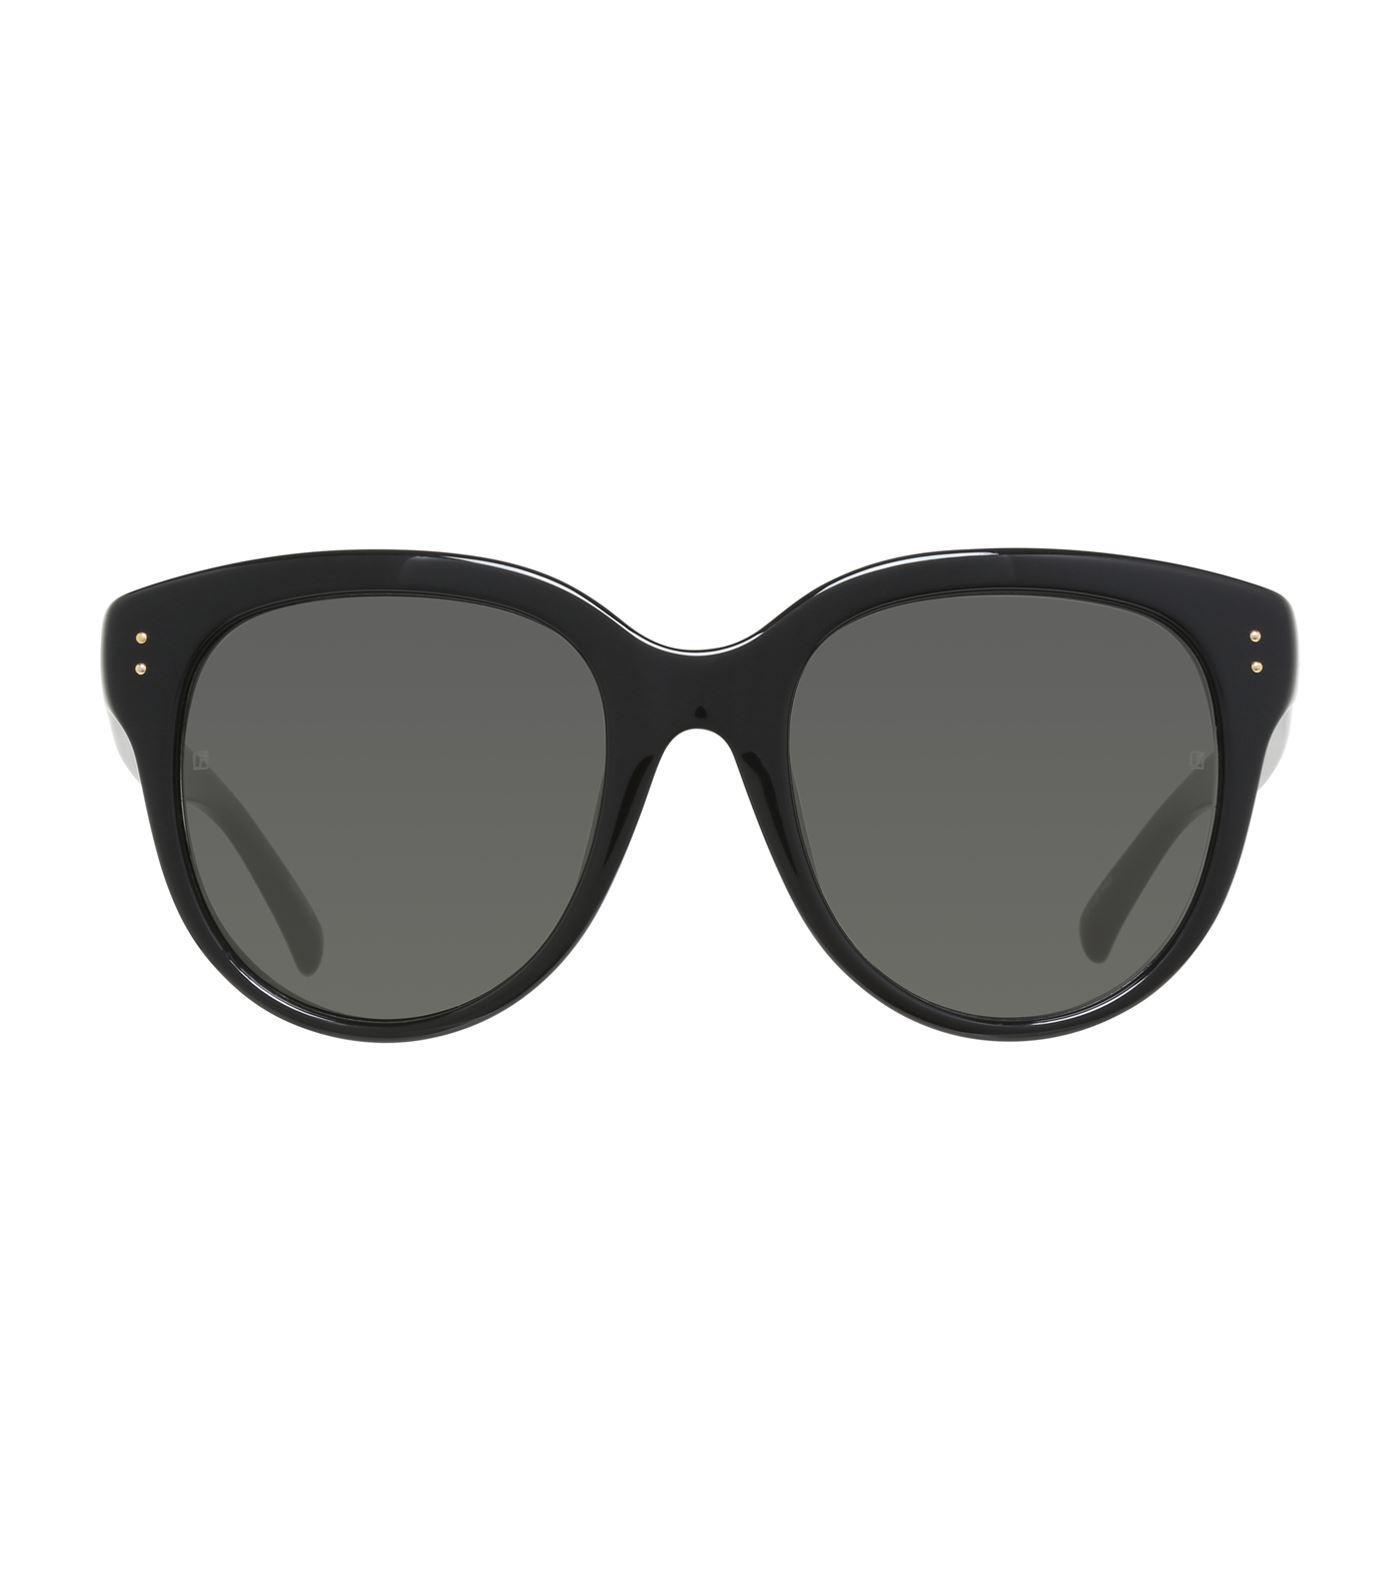 80644db00b0 Linda Farrow Oval Sunglasses